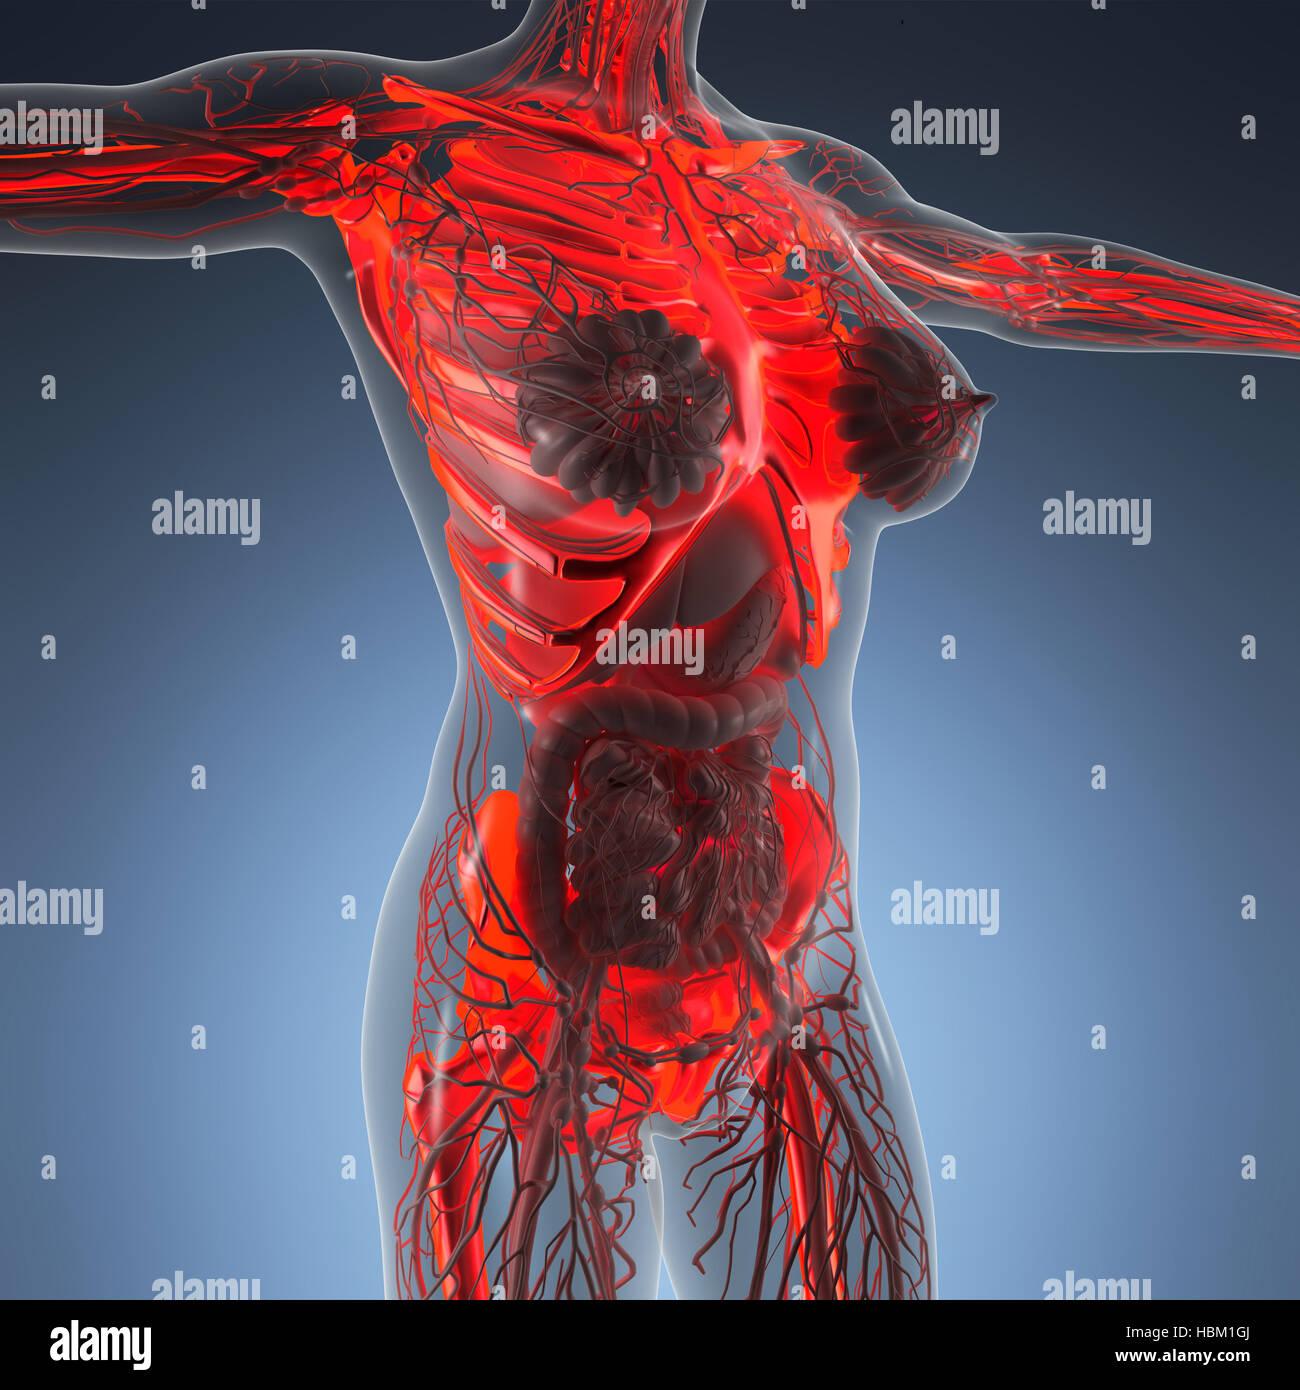 Anatomical Anatomy Physiology Pain Stockfotos & Anatomical Anatomy ...